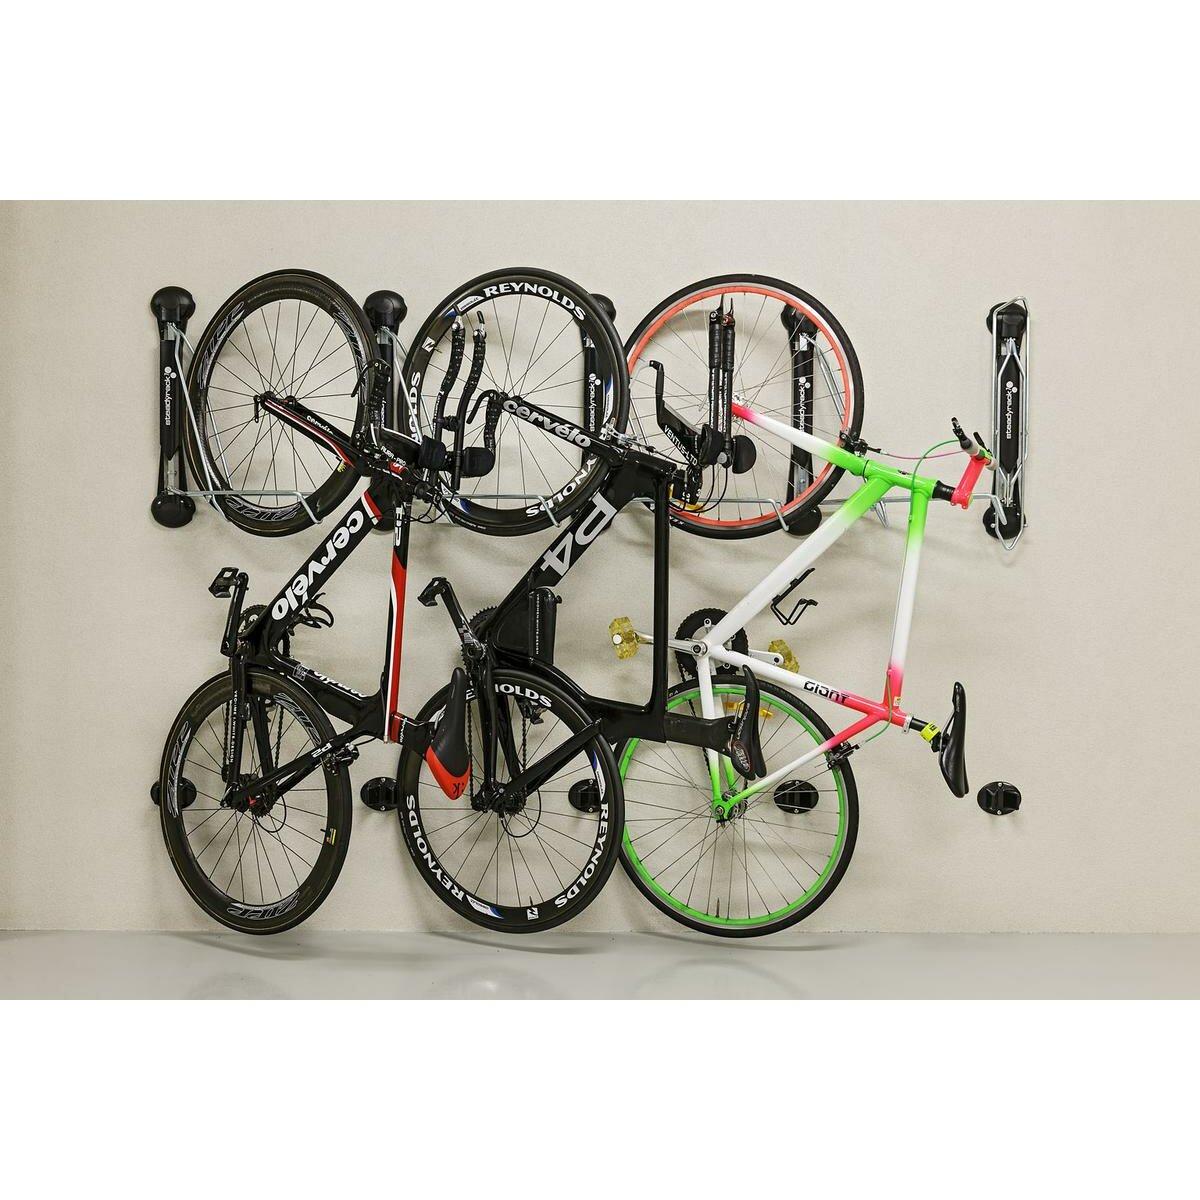 steadyrack bike racks fender rack vertical bike storage. Black Bedroom Furniture Sets. Home Design Ideas